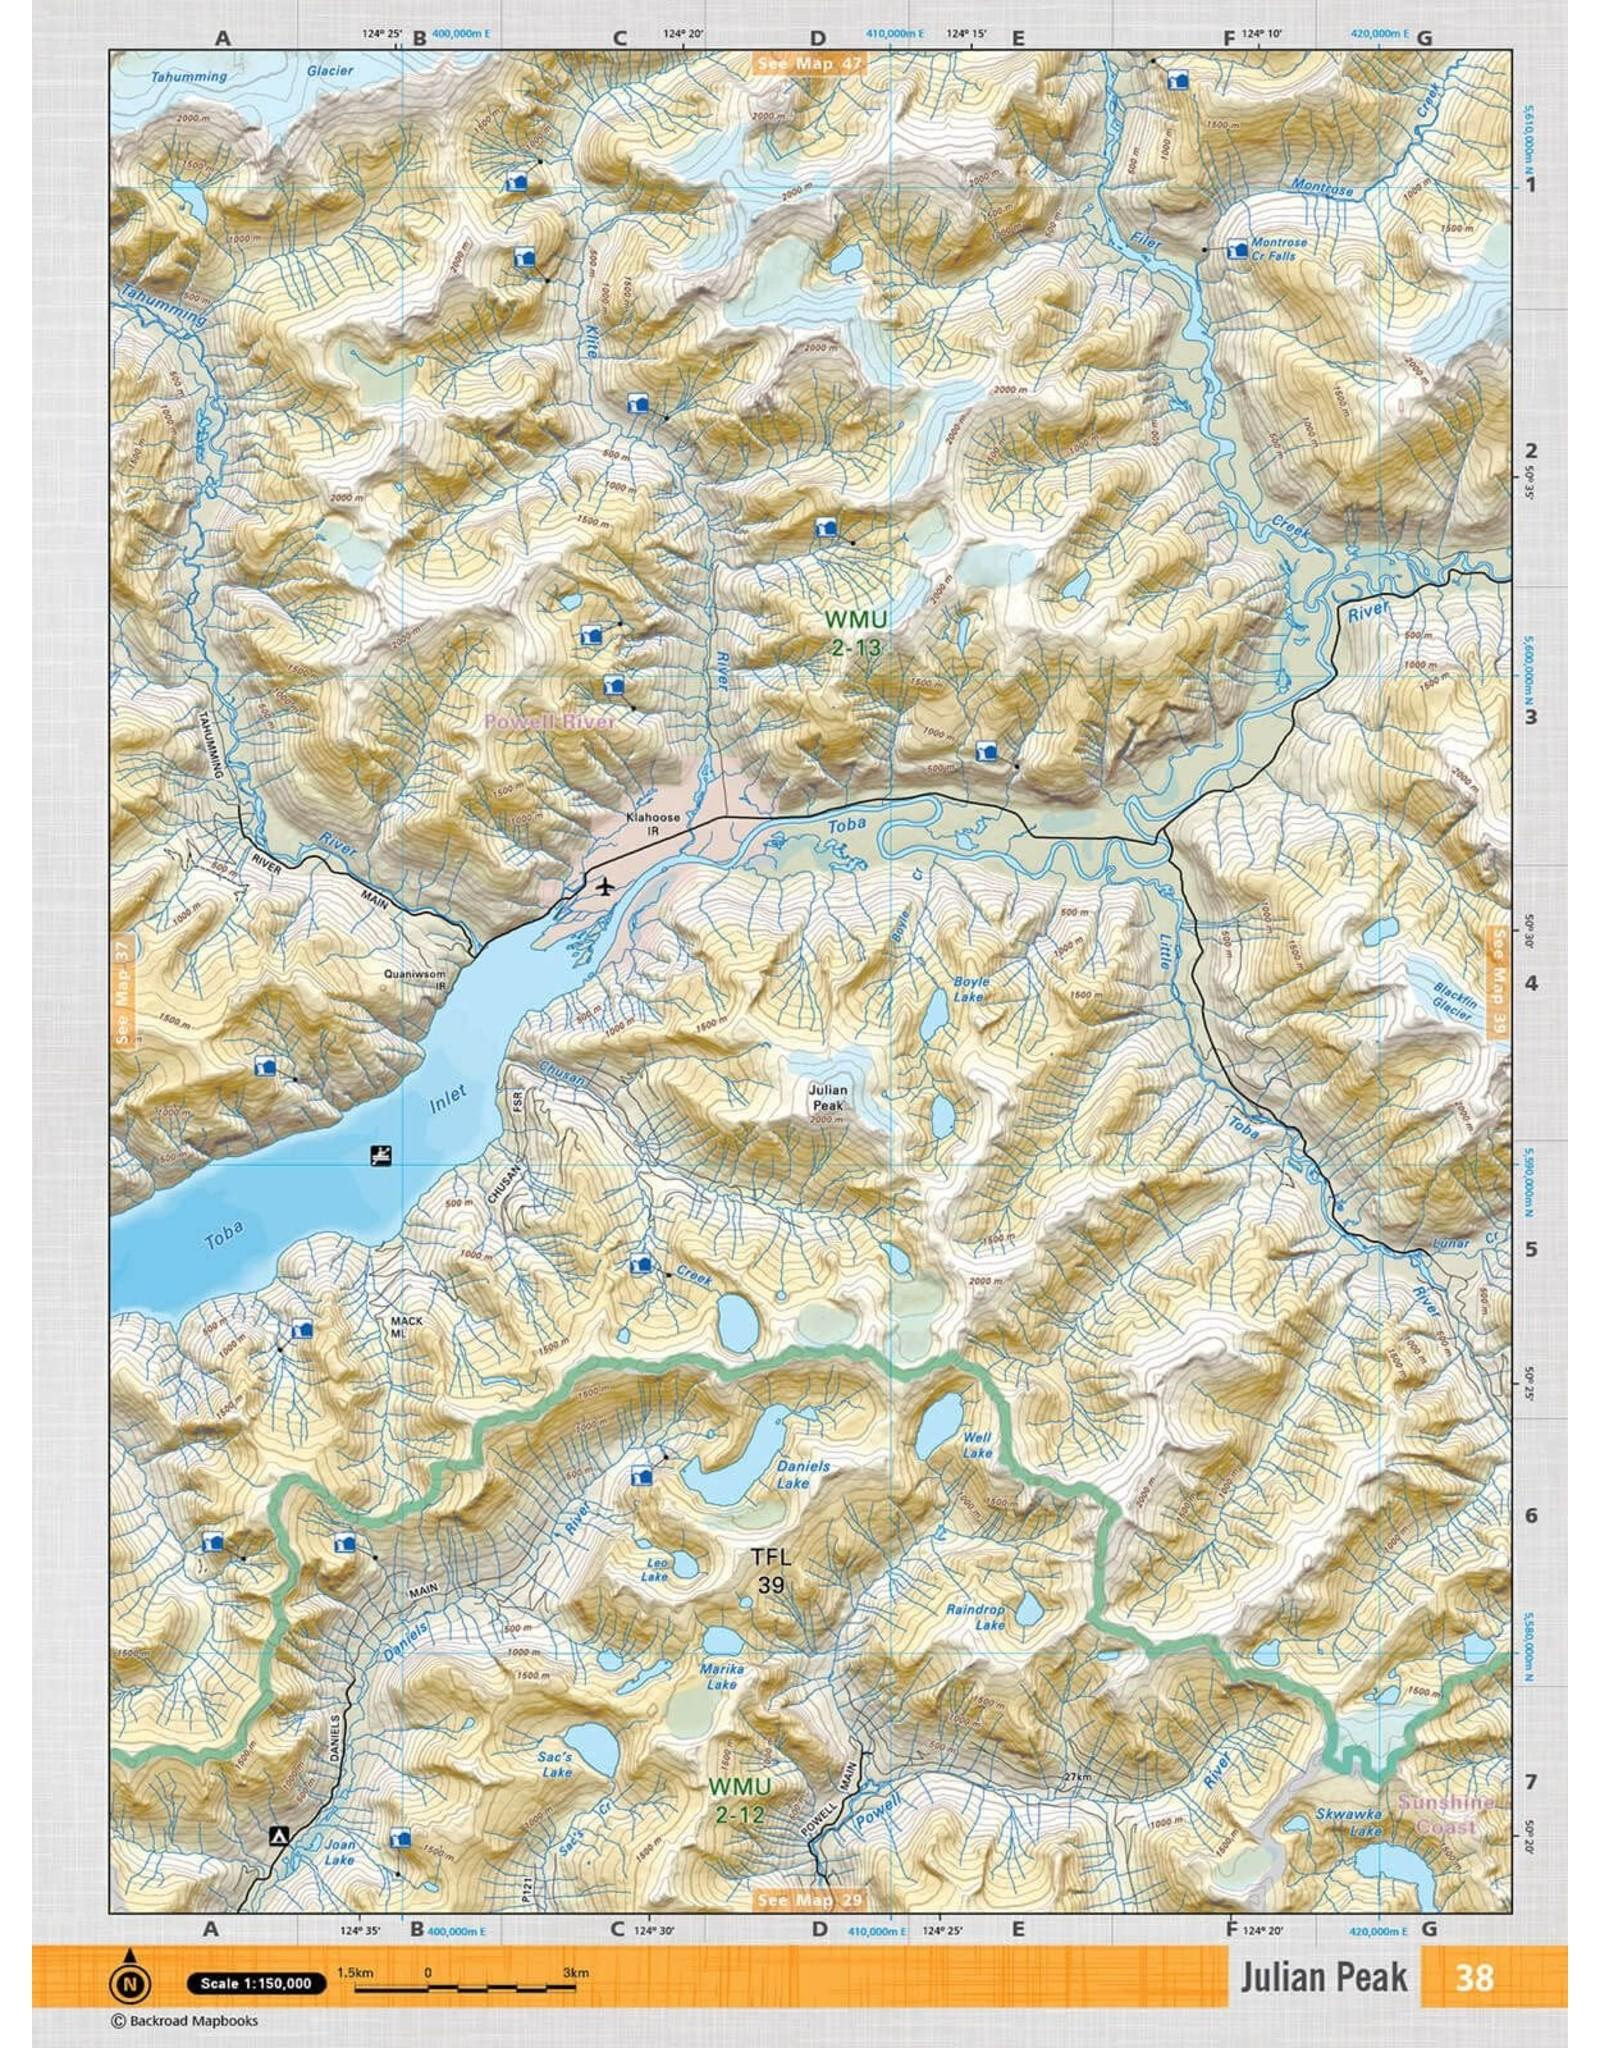 BACKROAD MAPBOOKS BRMB - VCBC38 - JULIAN PEAK